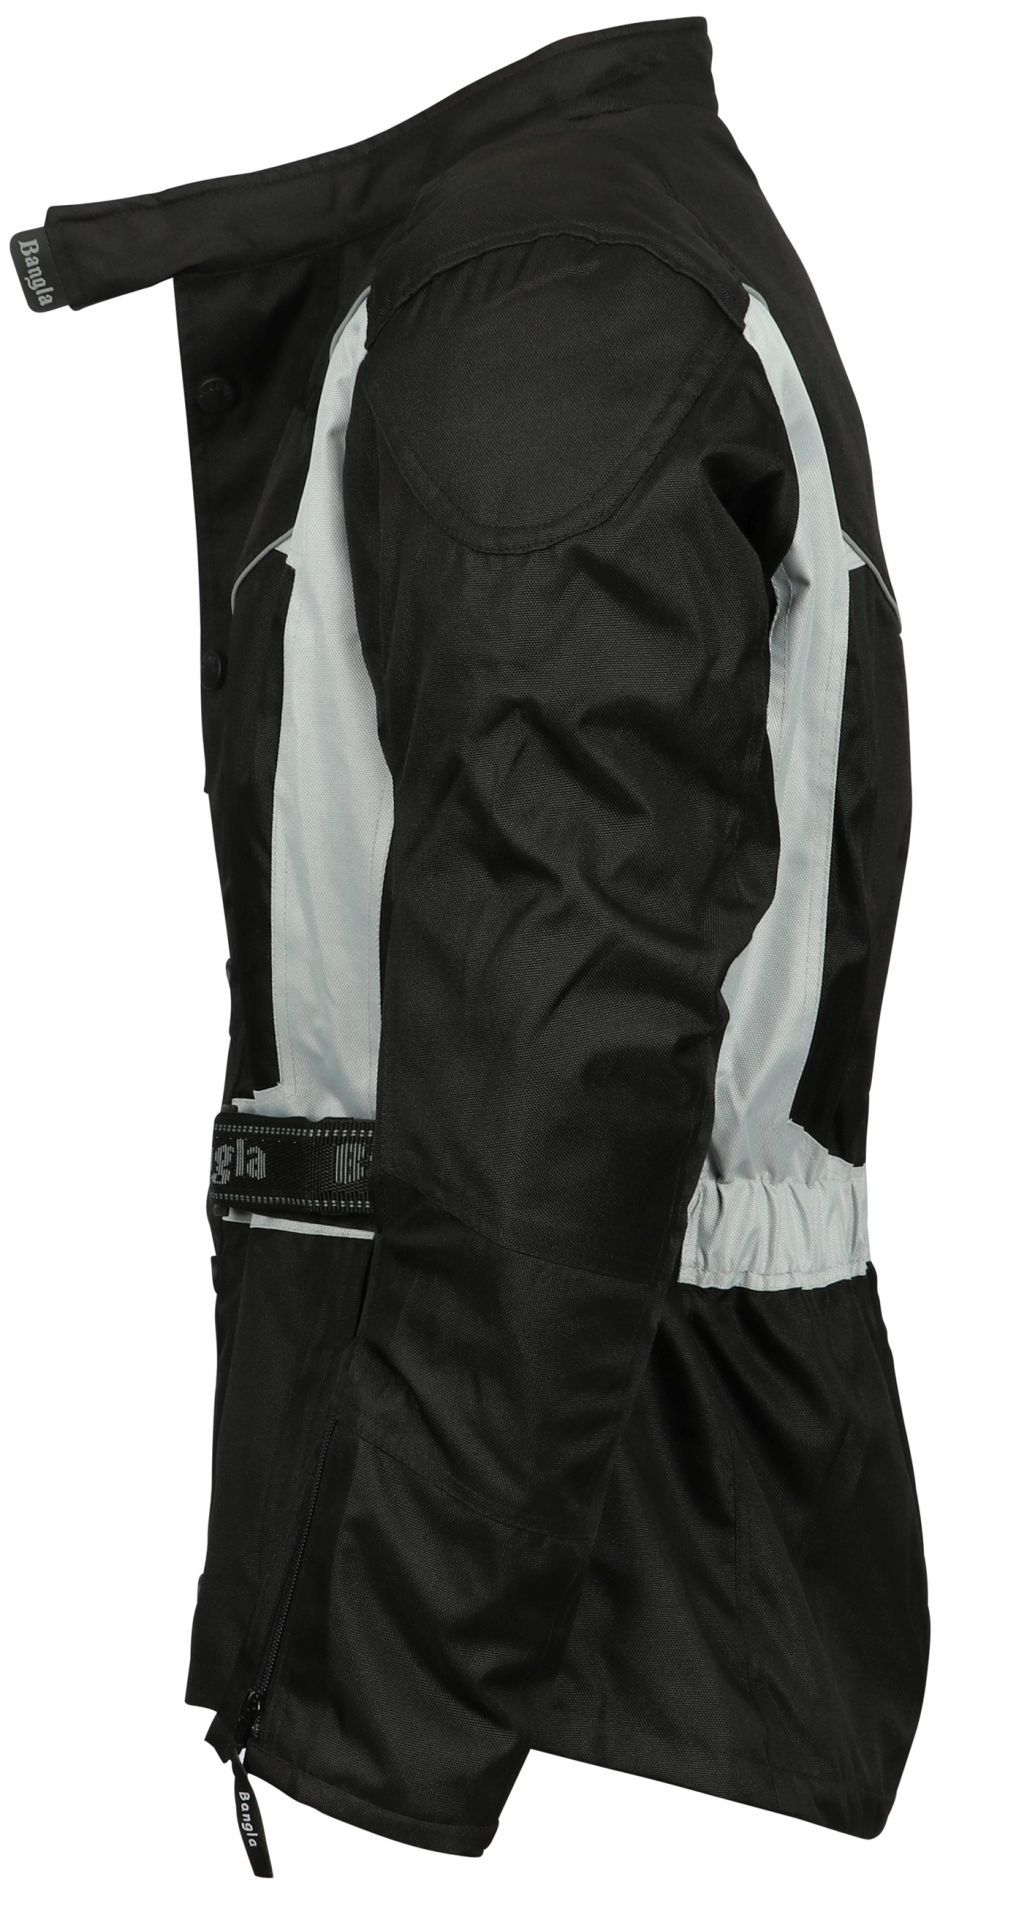 Bangla Motorradjacke Motorrad Jacke Textil Schwarz Grau Tourenjacke M - 7 XL